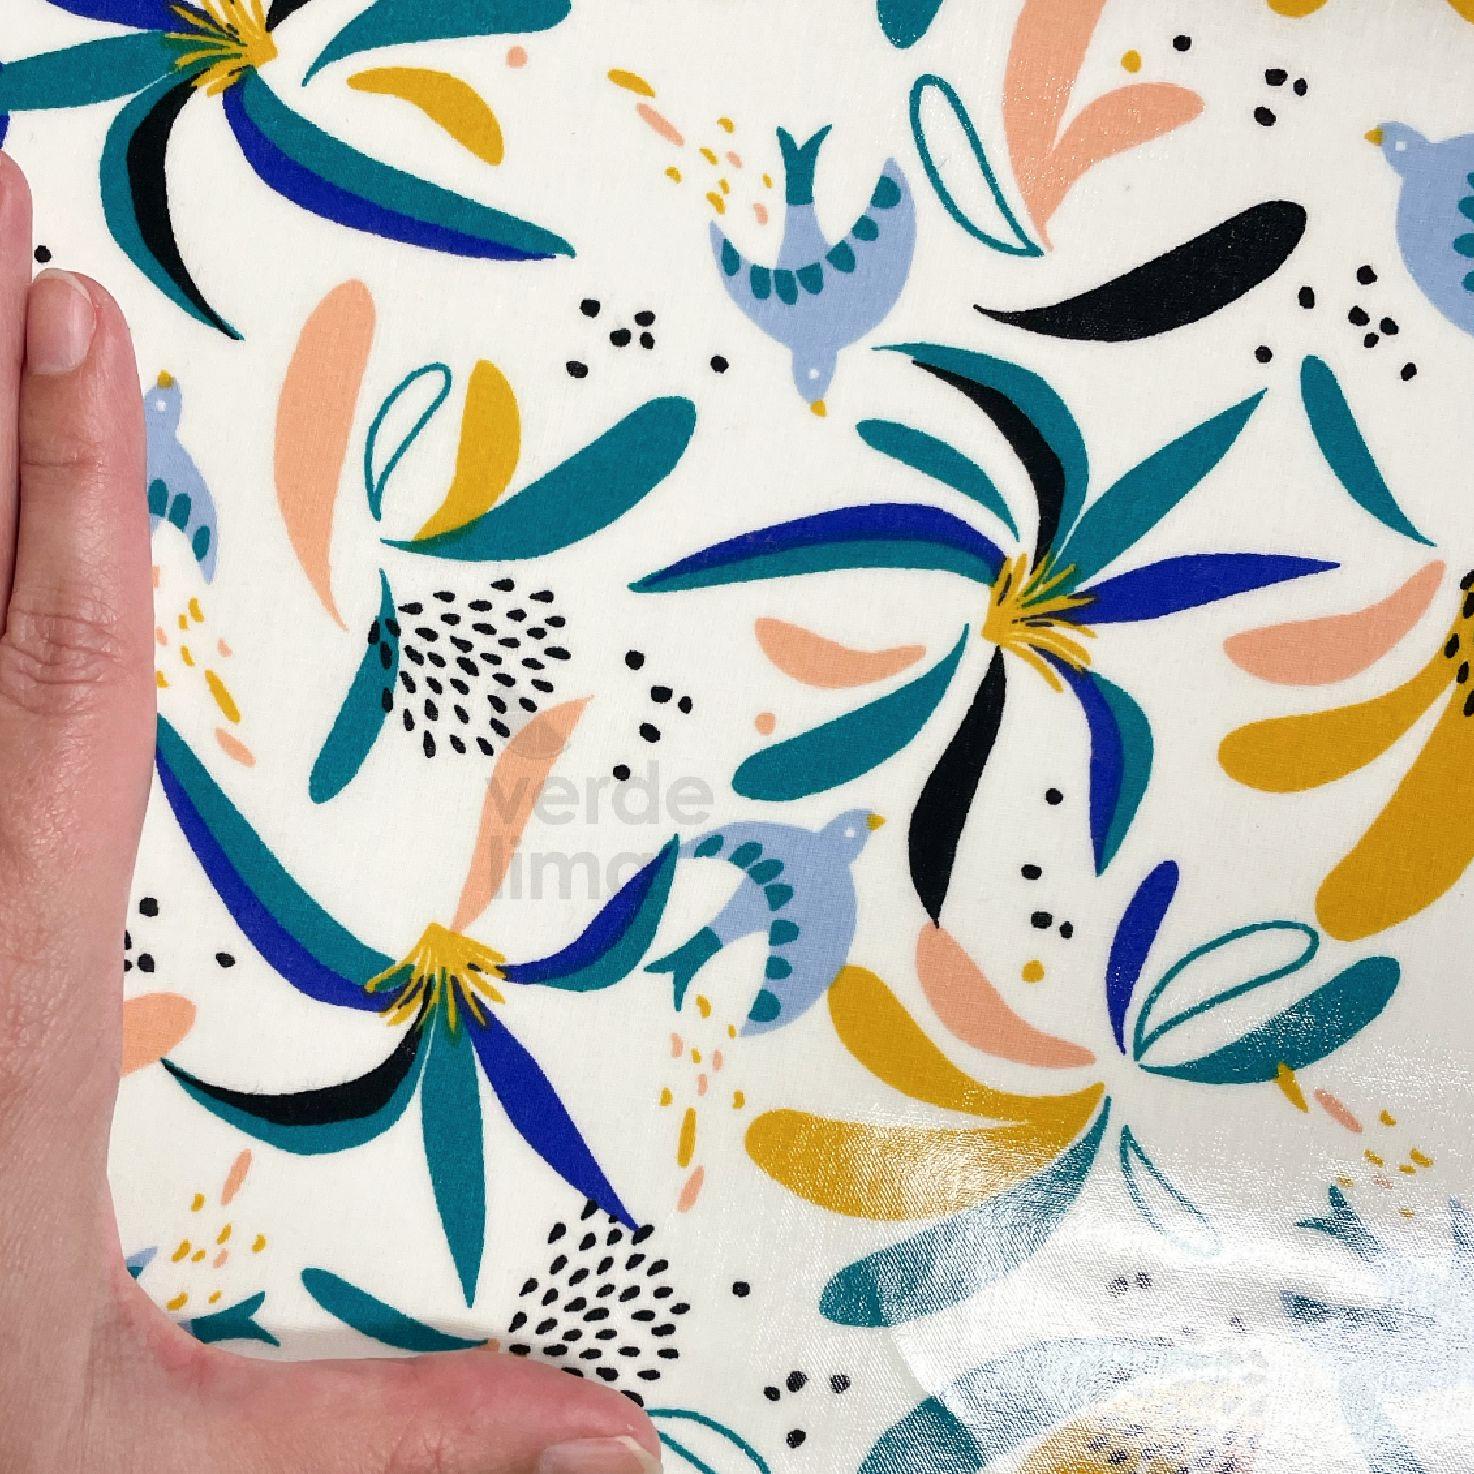 Flowers and birds (plastificado)